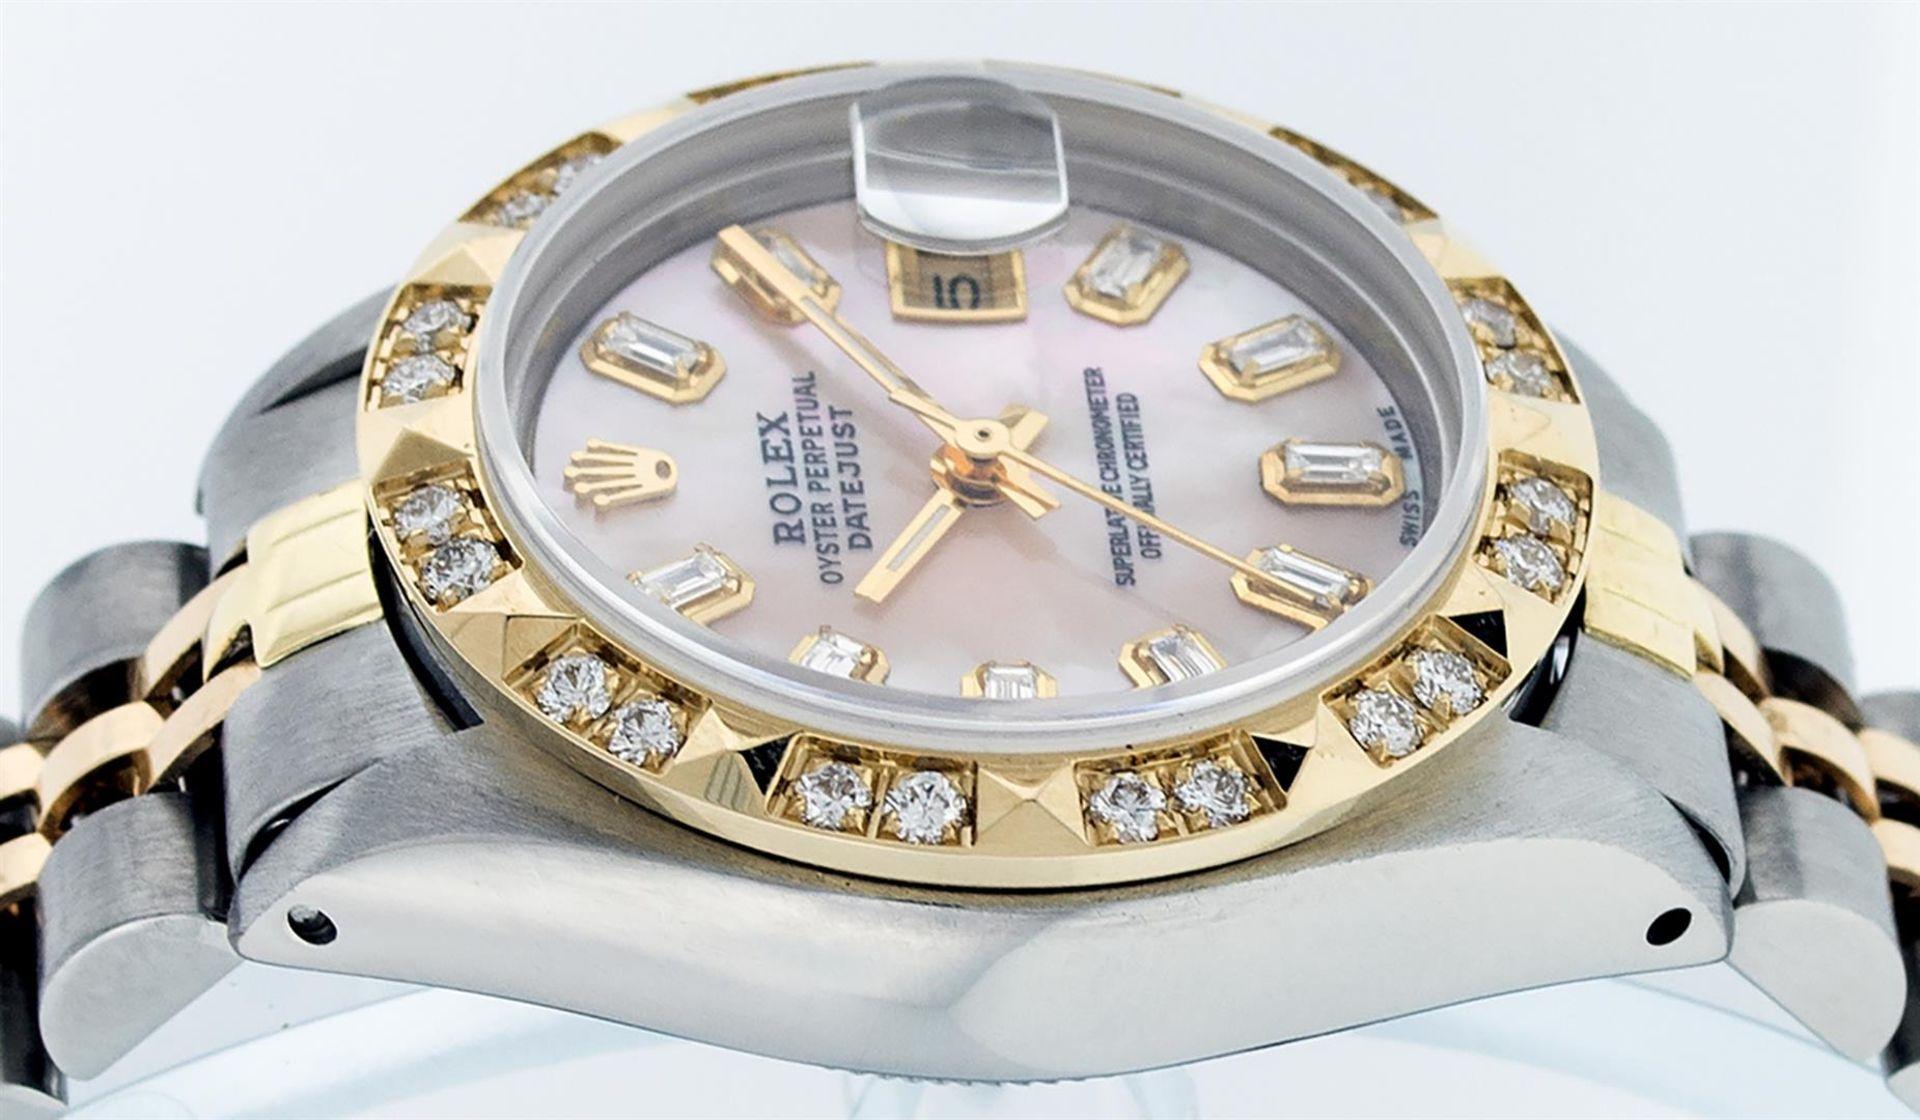 Rolex Ladies 26 2T Pink MOP Baguette 18K YG Diamond Bezel Serviced And Polished - Image 4 of 9